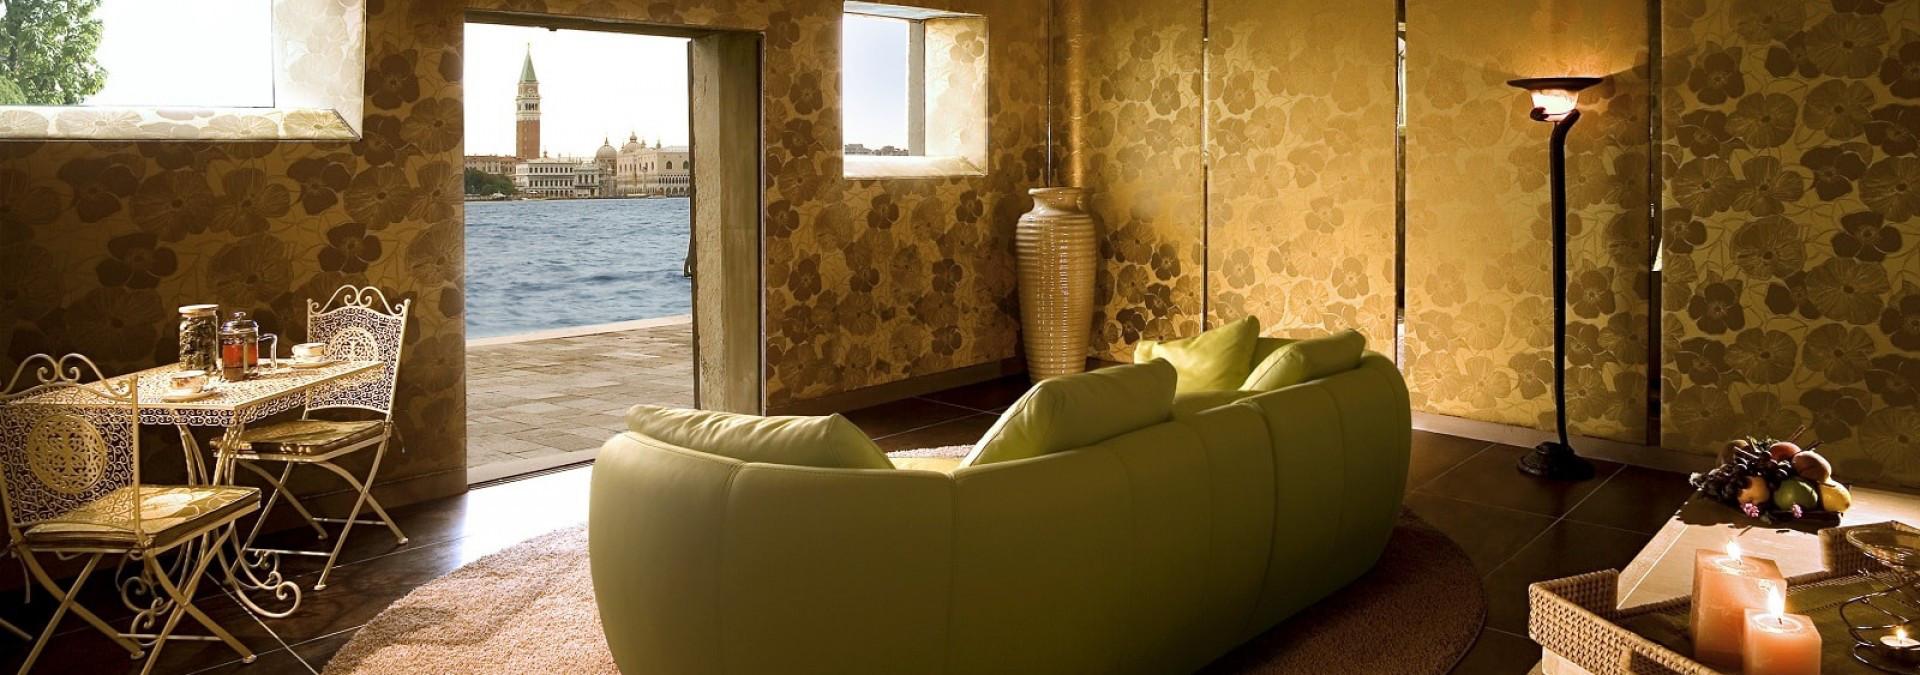 Bauer Palladio Hotel Spa & Resort Venezia